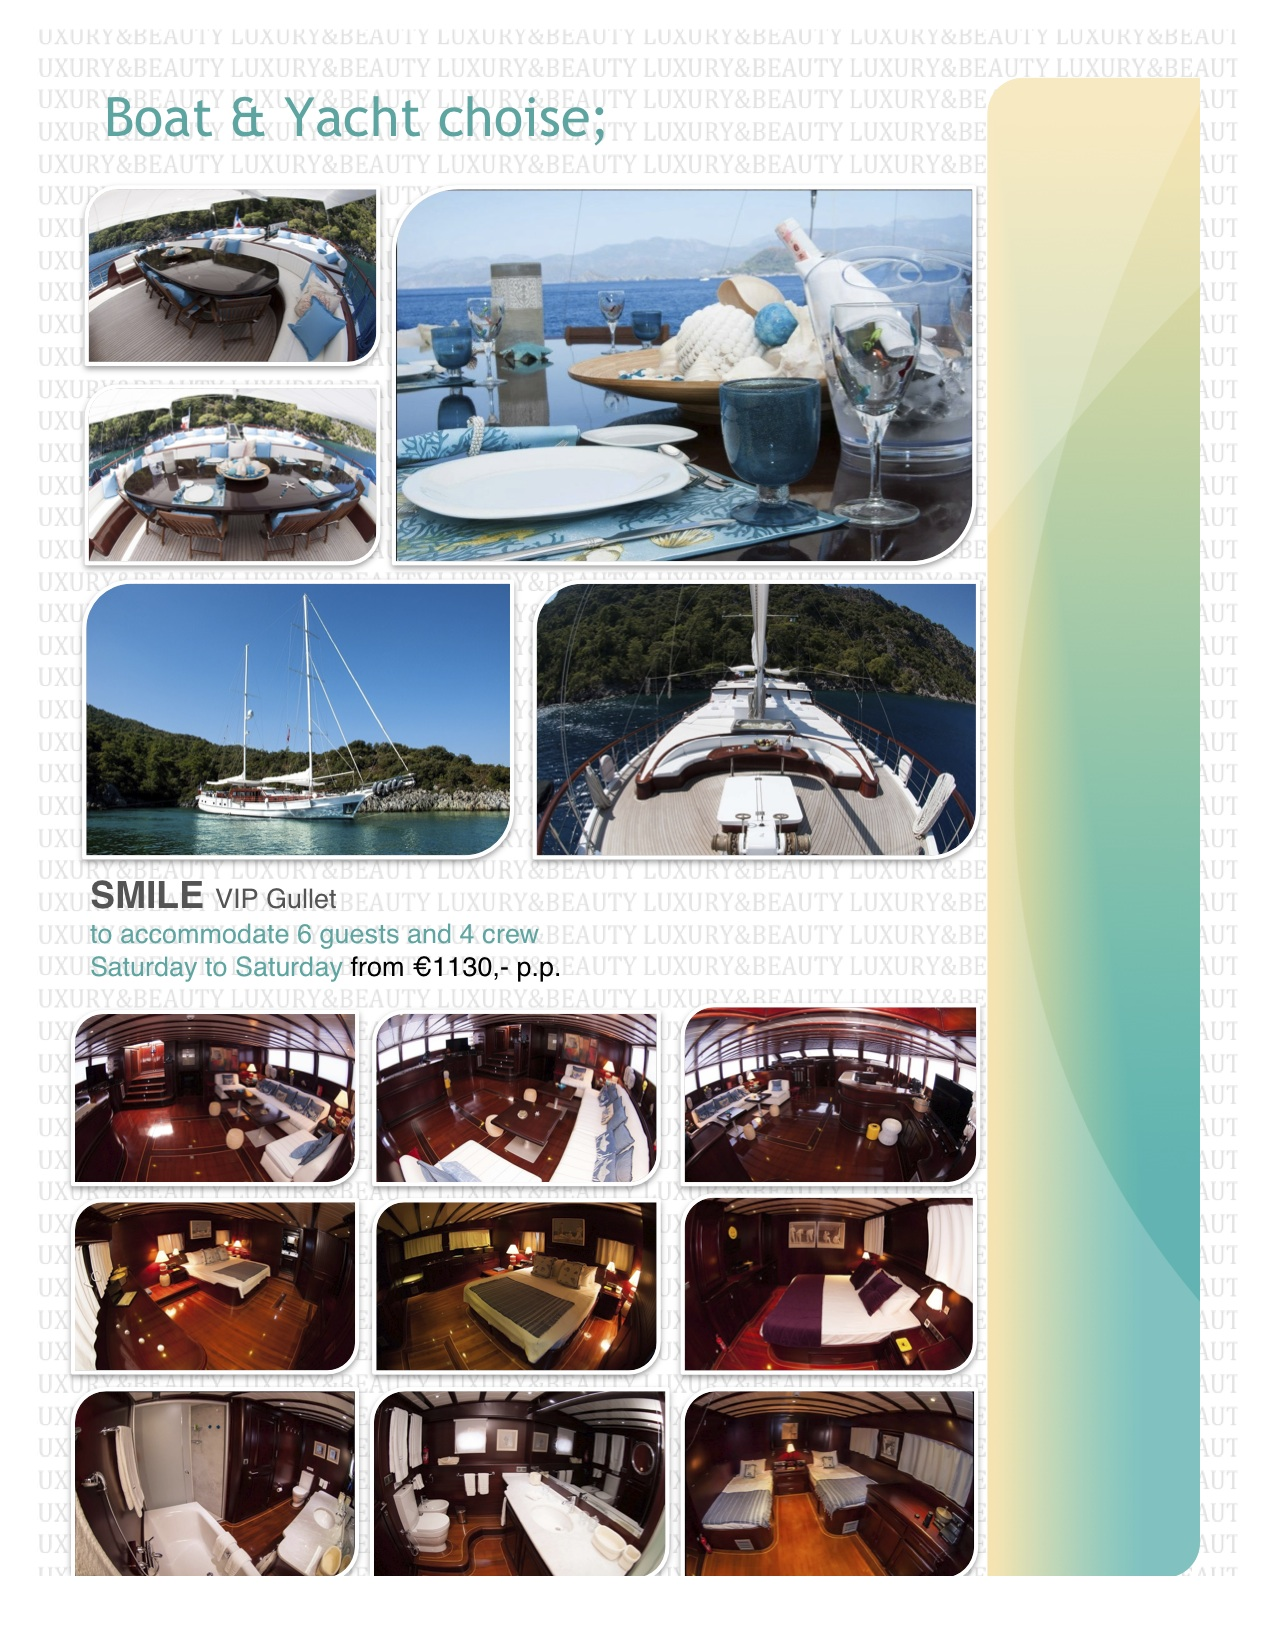 Luxury&Beauty_Yoga_Yacht.jpg12